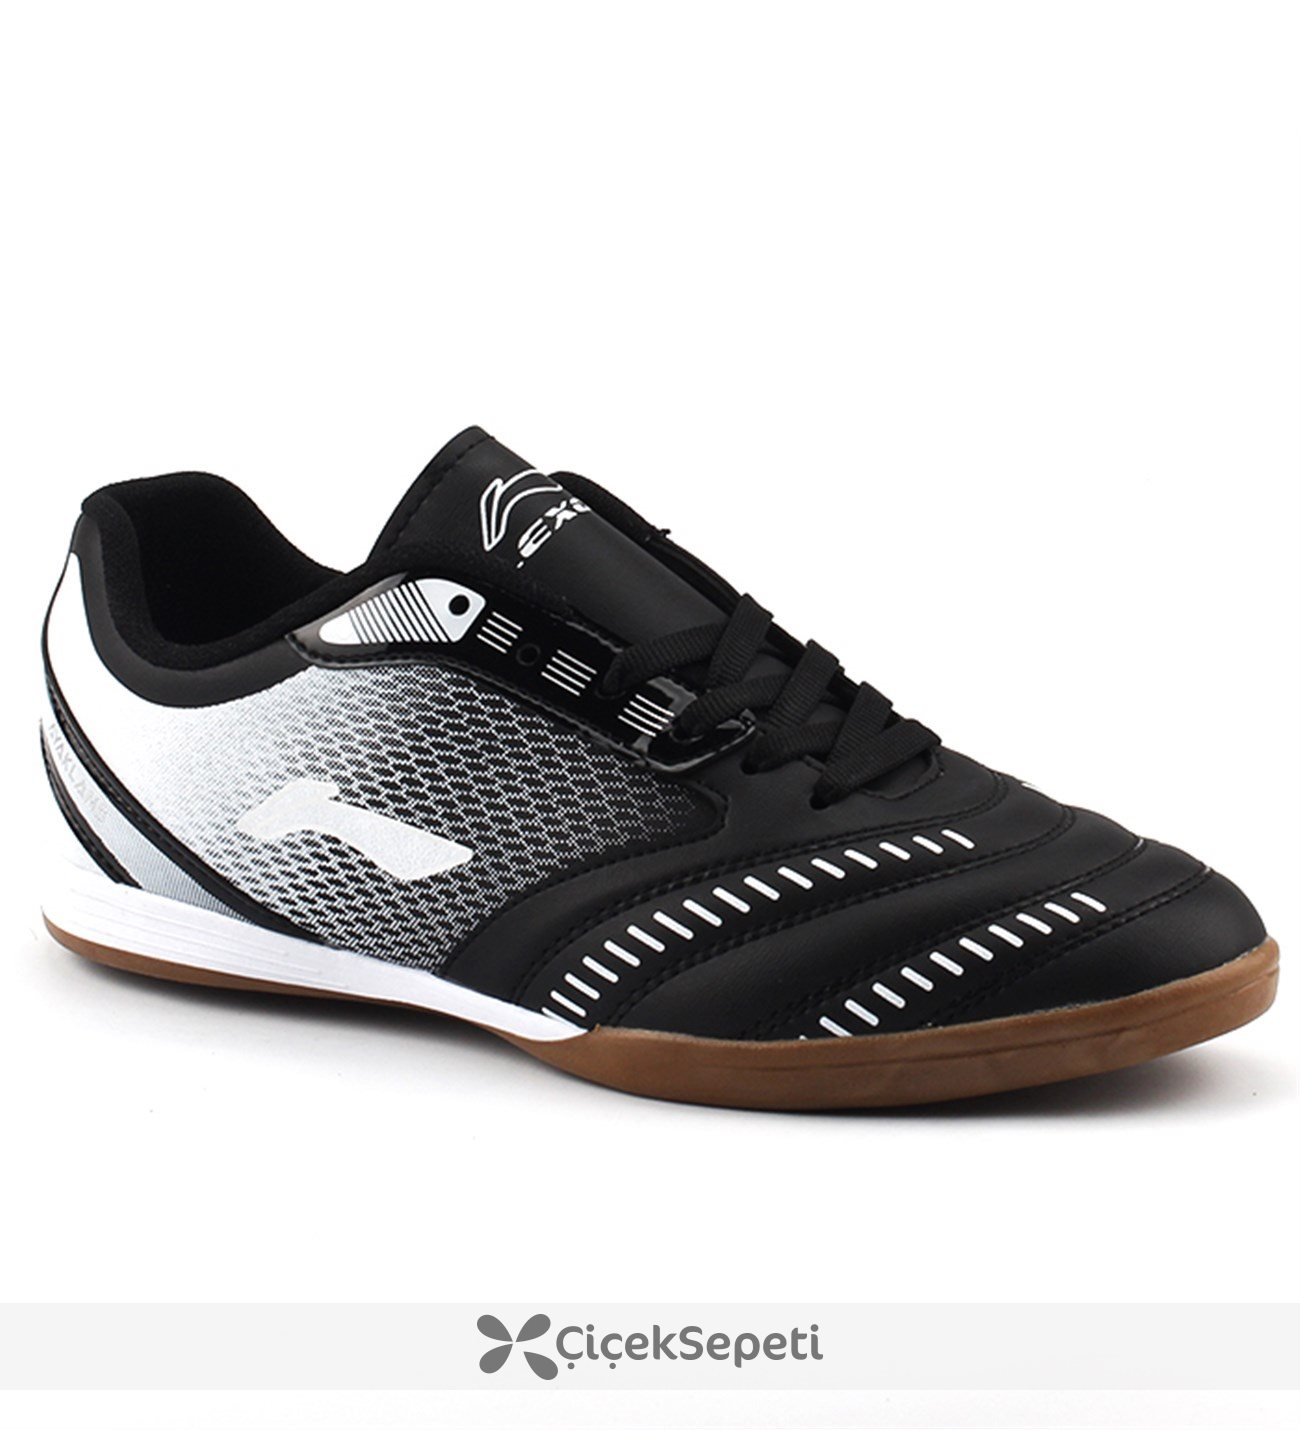 Ayakland 225 Siyah Futsal Hentbol Voleybol Erkek Salon Spor Ayakkabı Siyah